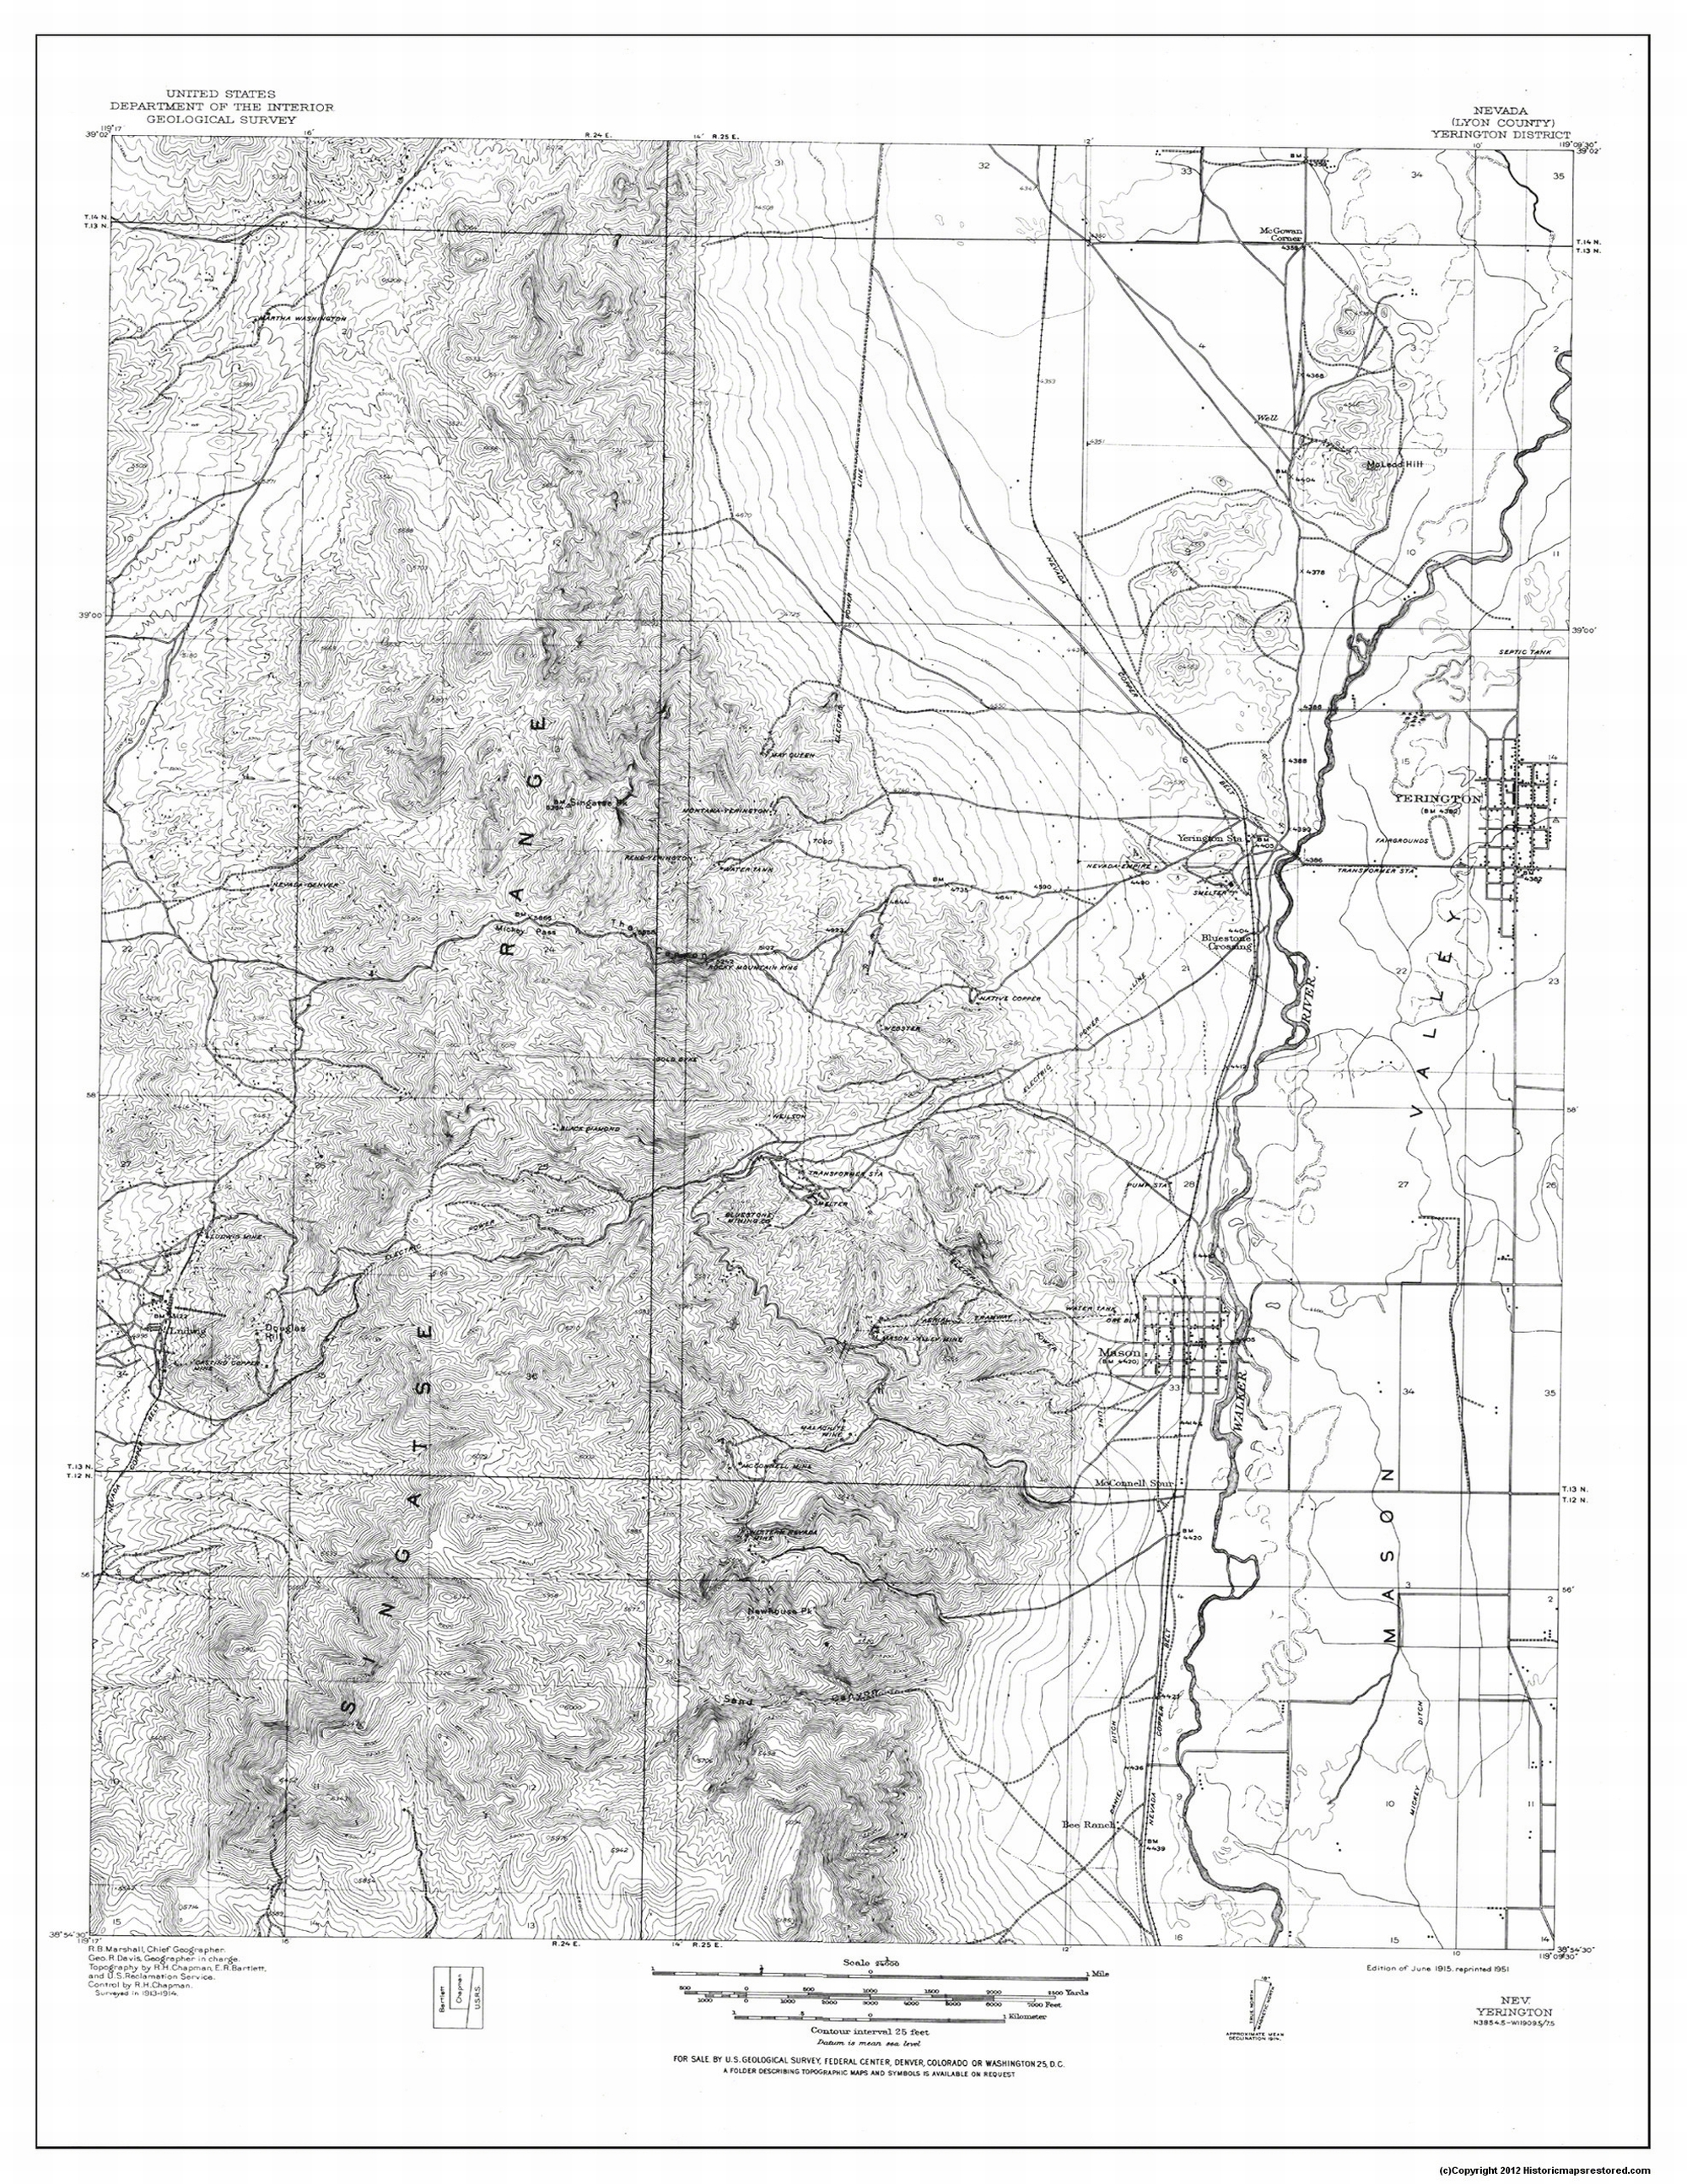 Topographical Map Print - Yerington District Nevada - USGS 1915 - 23 on alamo nv map, winnemucca nv map, california nv map, summerlin south nv map, mound house nv map, vya nv map, needles nv map, las vegas nv map, stead nv map, silver peak nv map, gardnerville nv map, mason valley nv map, coyote springs nv map, st. george nv map, reno nv map, panaca nv map, valley of fire nv map, kingston nv map, duckwater nv map, pahrump nv map,